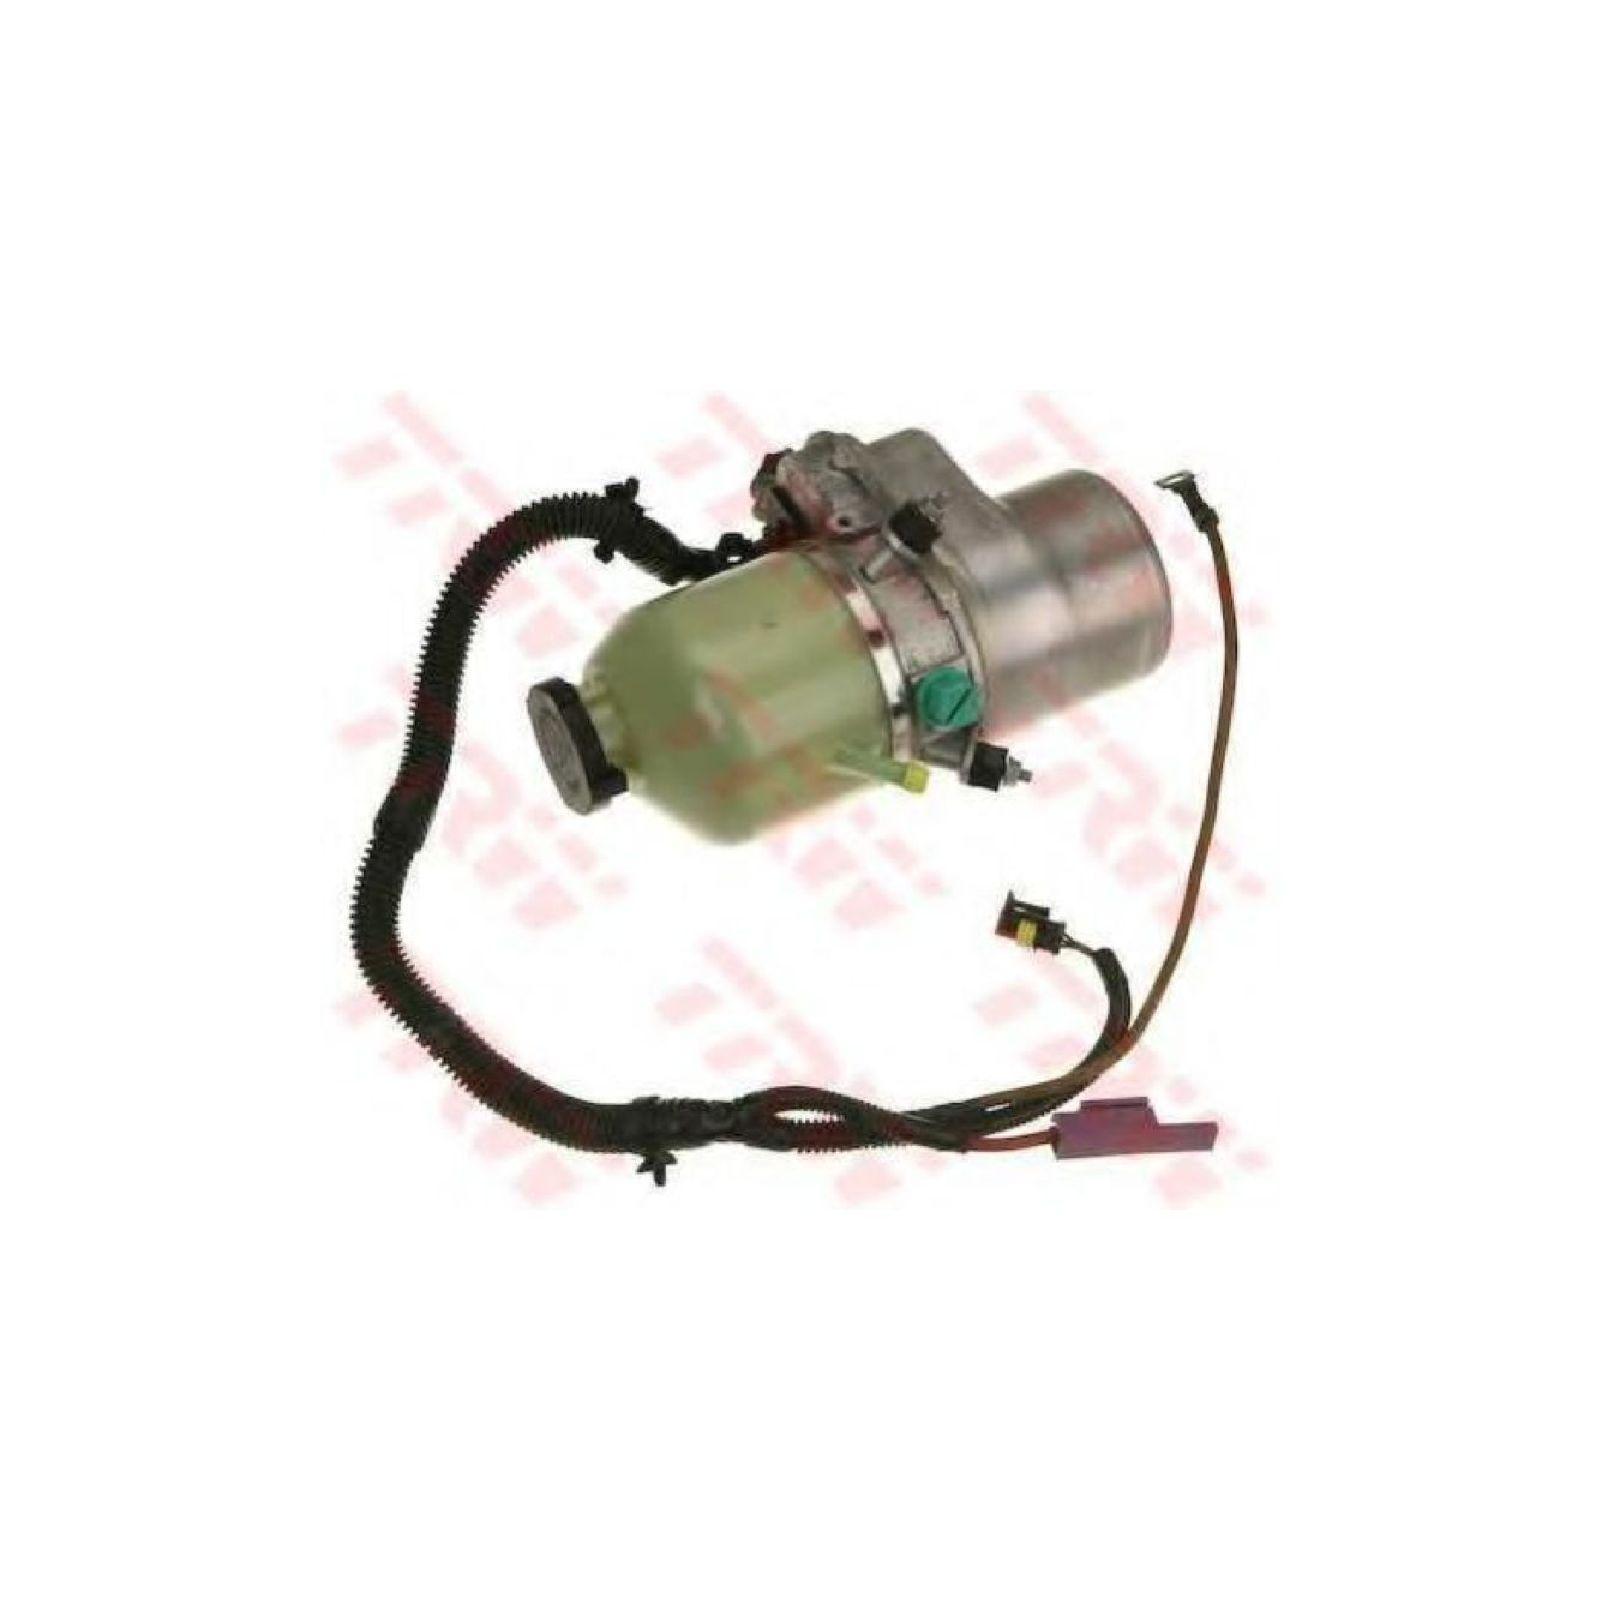 Trw hydraulic power steering pump pas genuine oe quality for Trw ross hydraulic motor